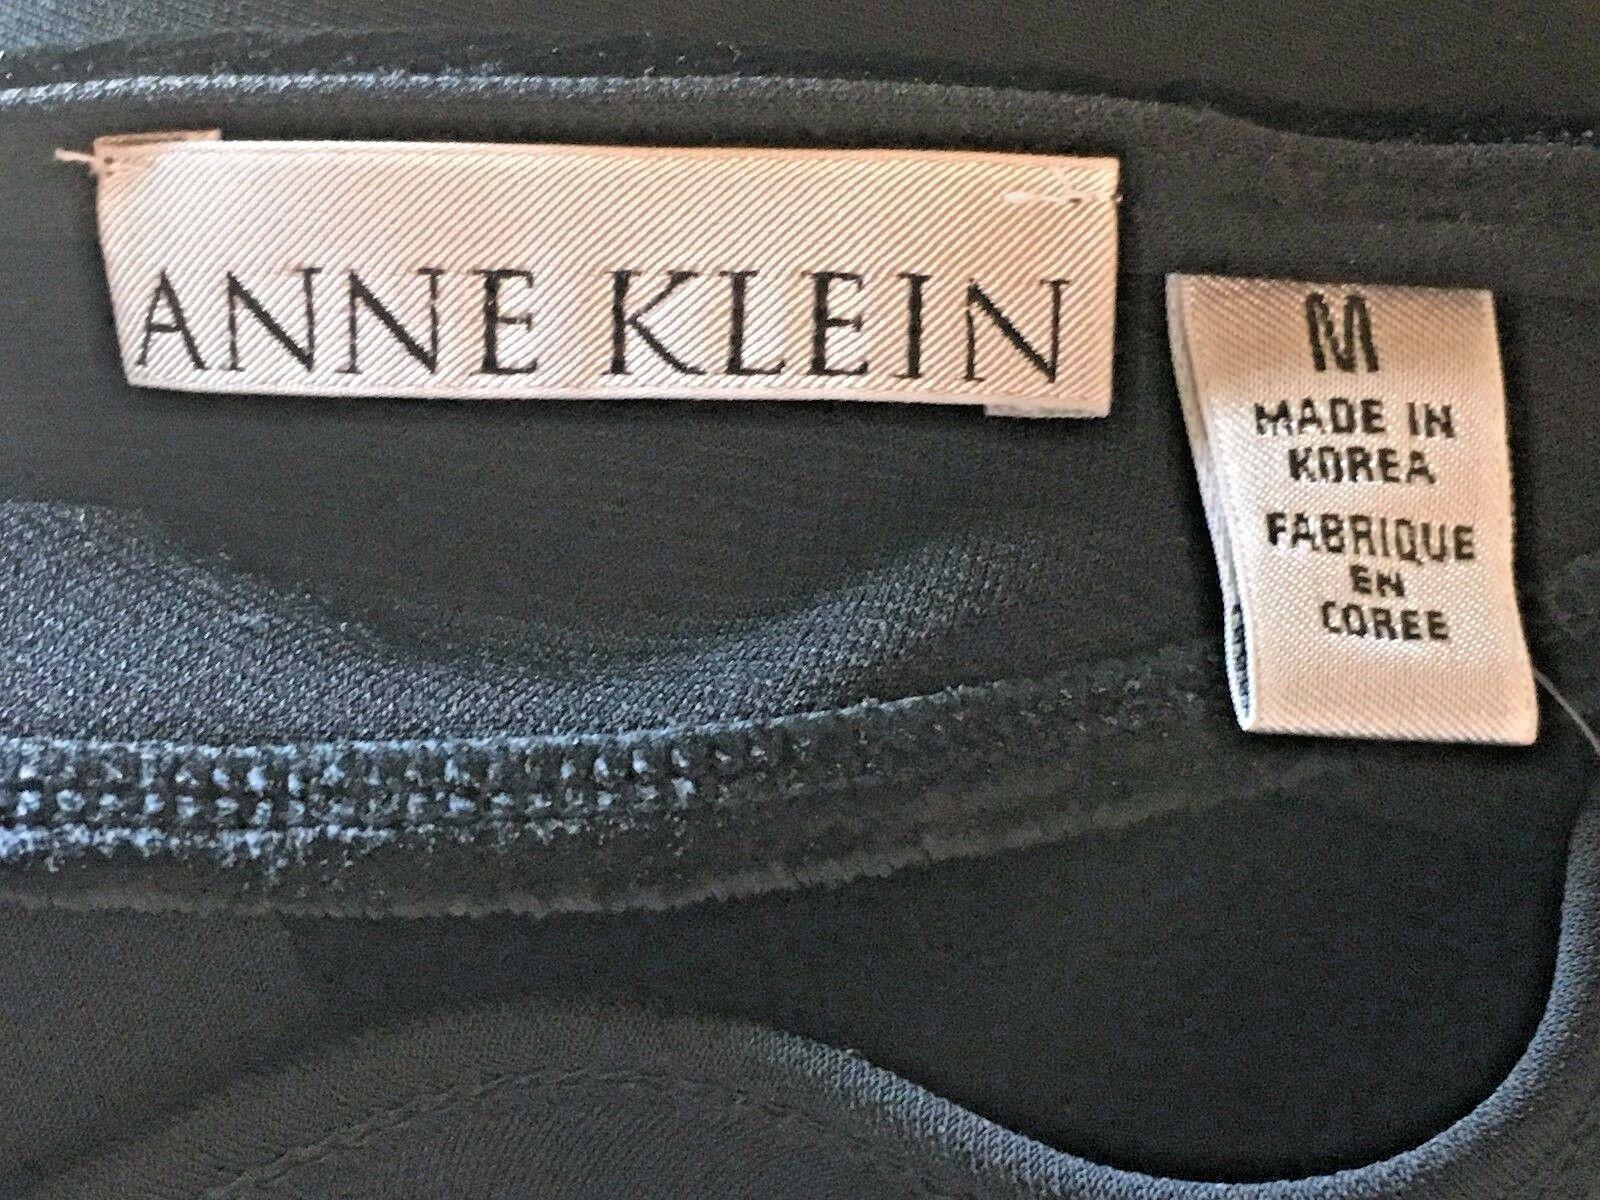 Anne Klein Black Velvet & Rayon Cutout Long Formal Dress size S M NWT $225 DS7 image 8